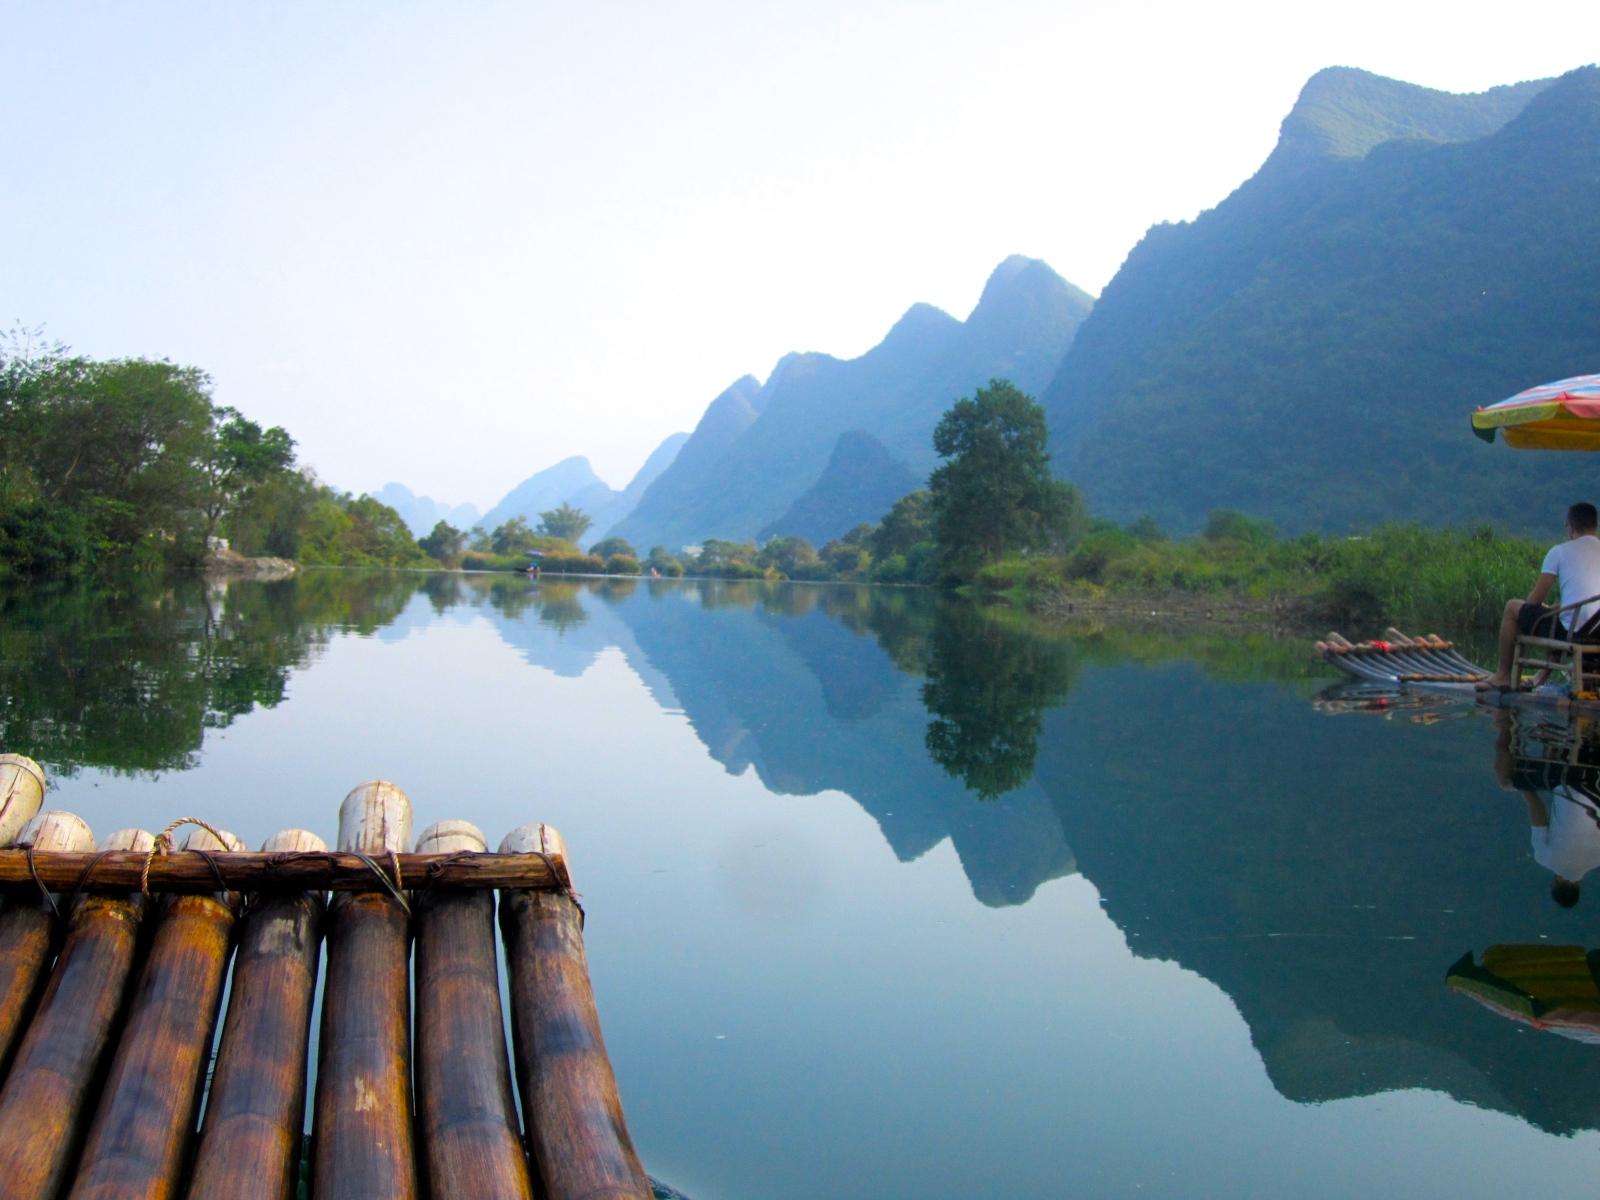 Rafting down the Yulong River among the limestone hills in Yangshuo, China